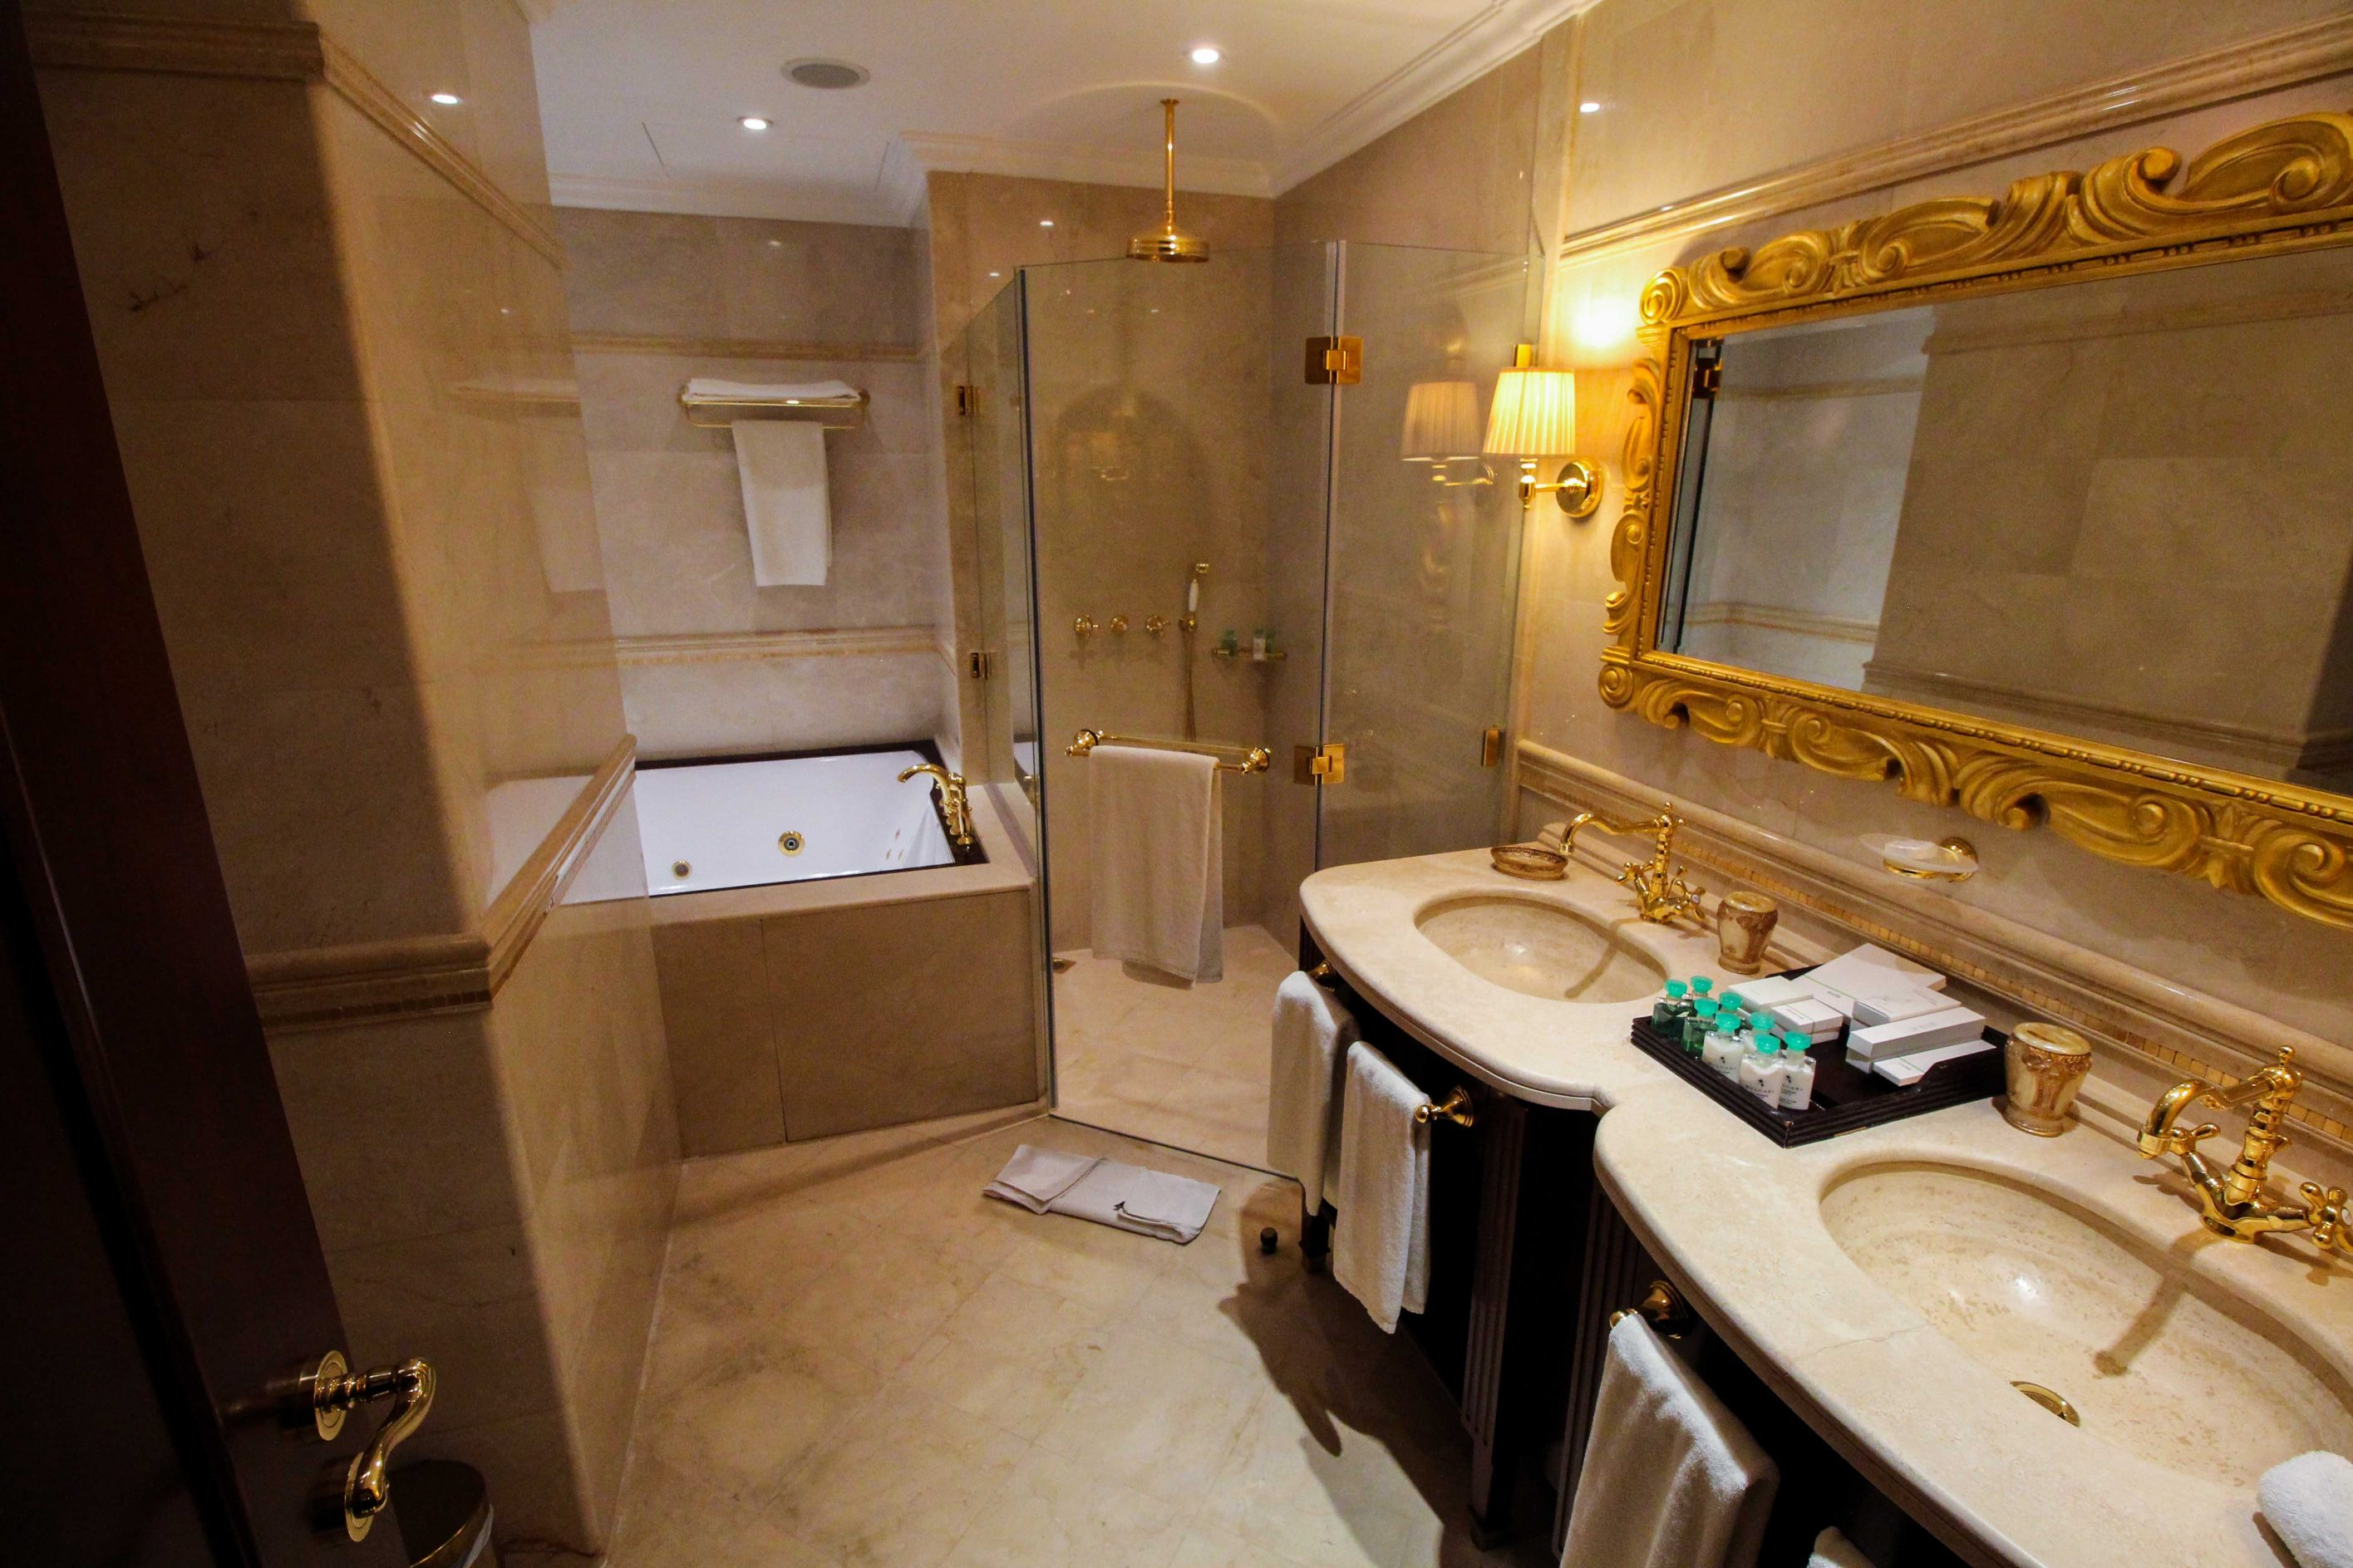 11 Sterne Hotel Badezimmer